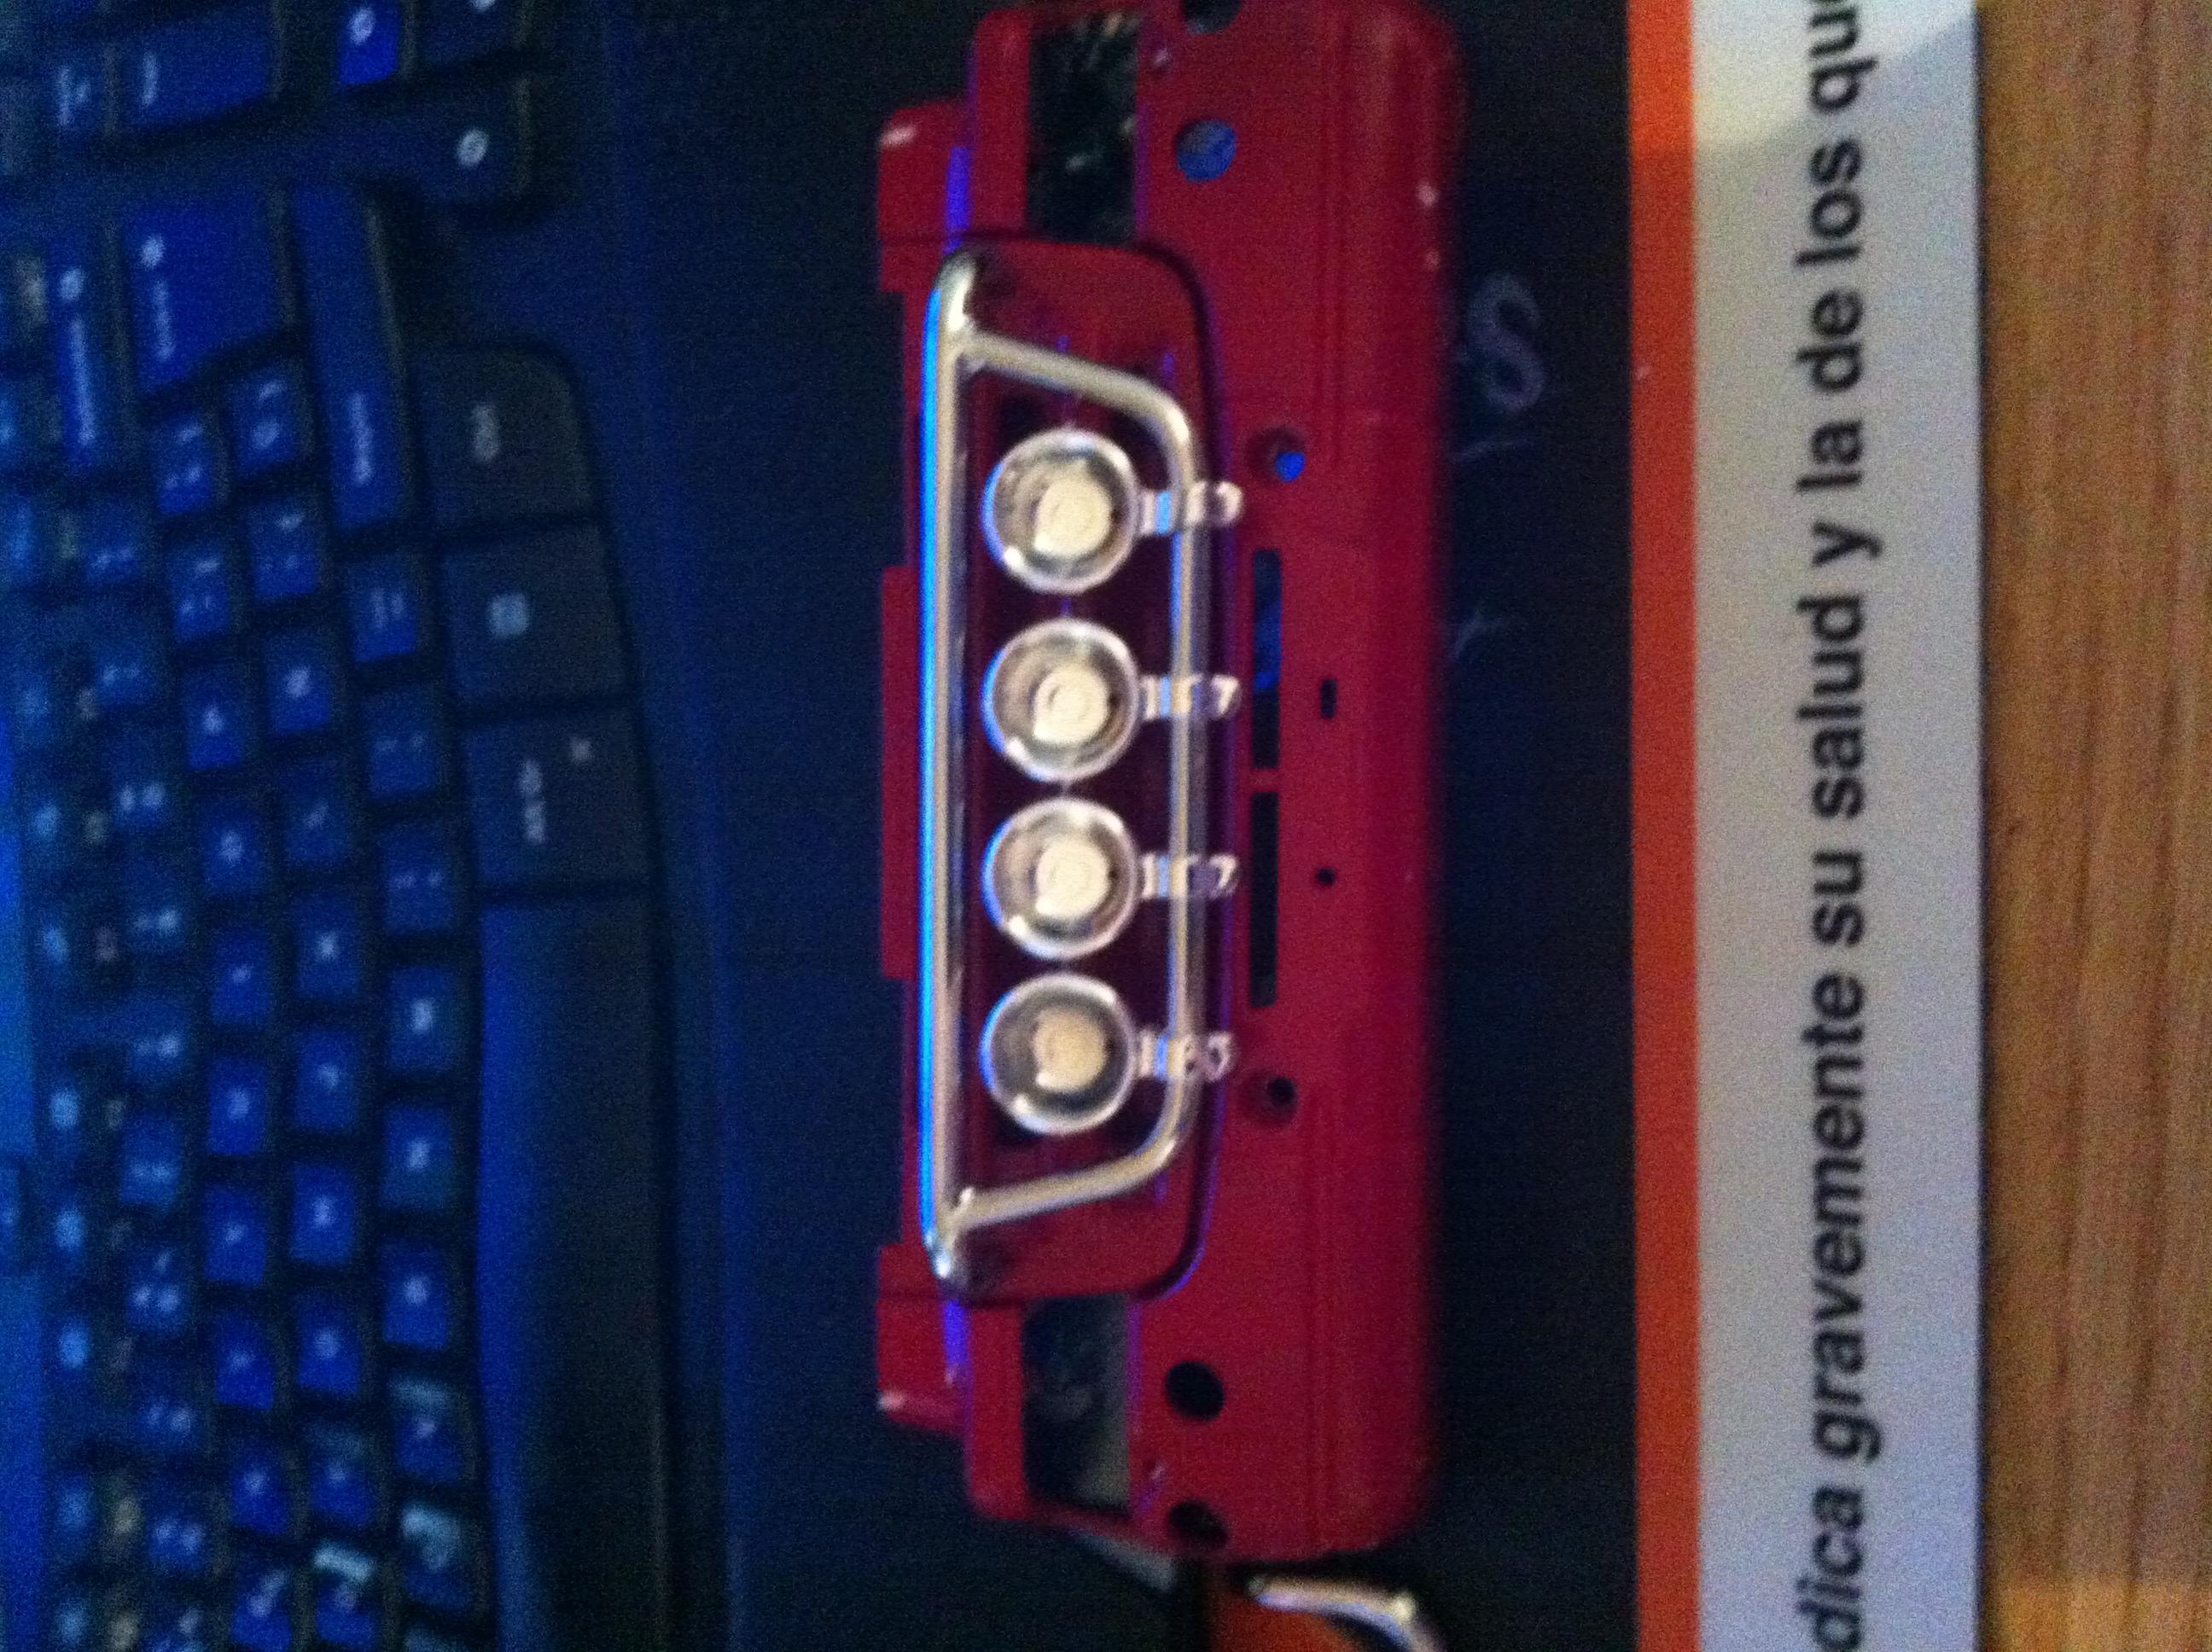 Scania R620 6x4 Servonaut Marcorev - Página 3 Img1588th